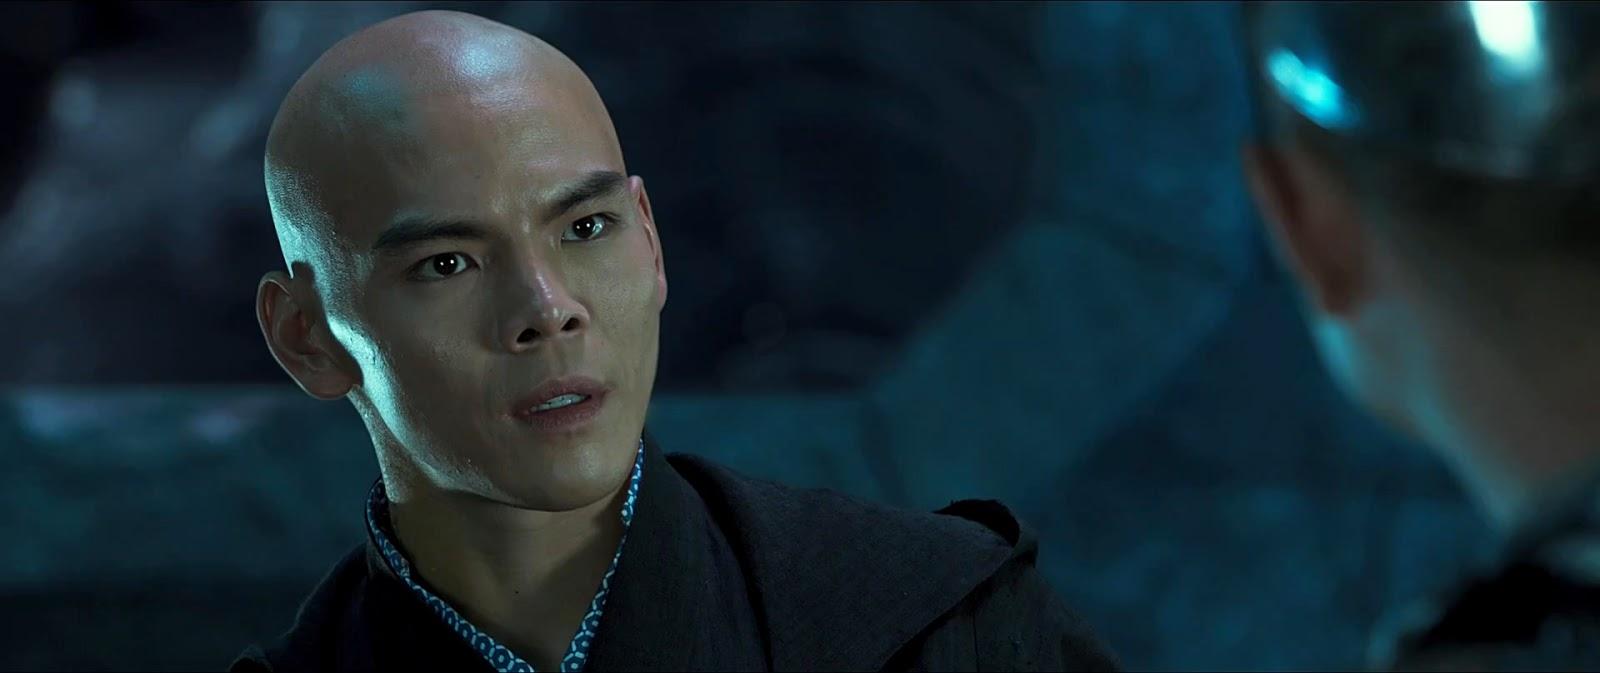 Screenshot League Of God (2016) Chinese BluRay 1080p 5 CH - www.uchiha-uzuma.com 03